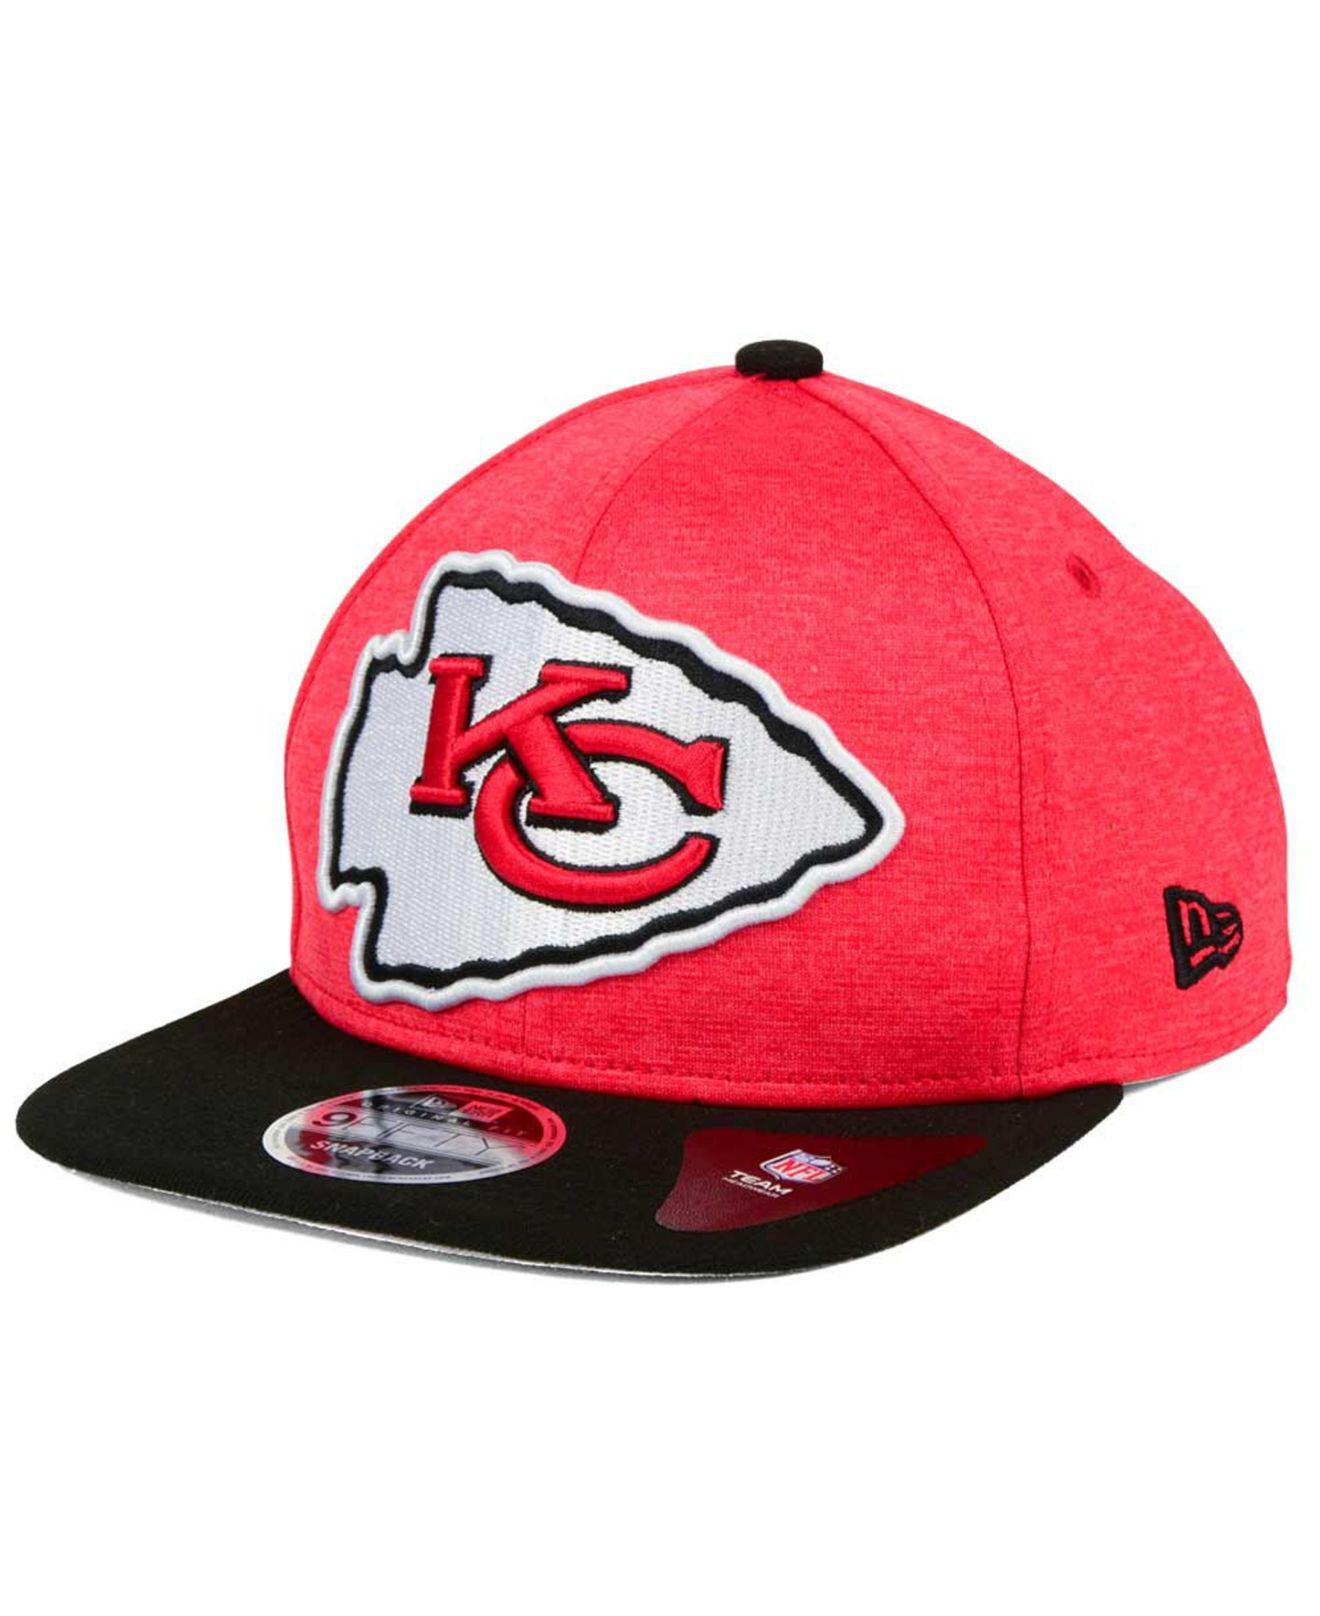 84fbd2abd4e Lyst - KTZ Kansas City Chiefs Heather Huge 9fifty Snapback Cap in ...